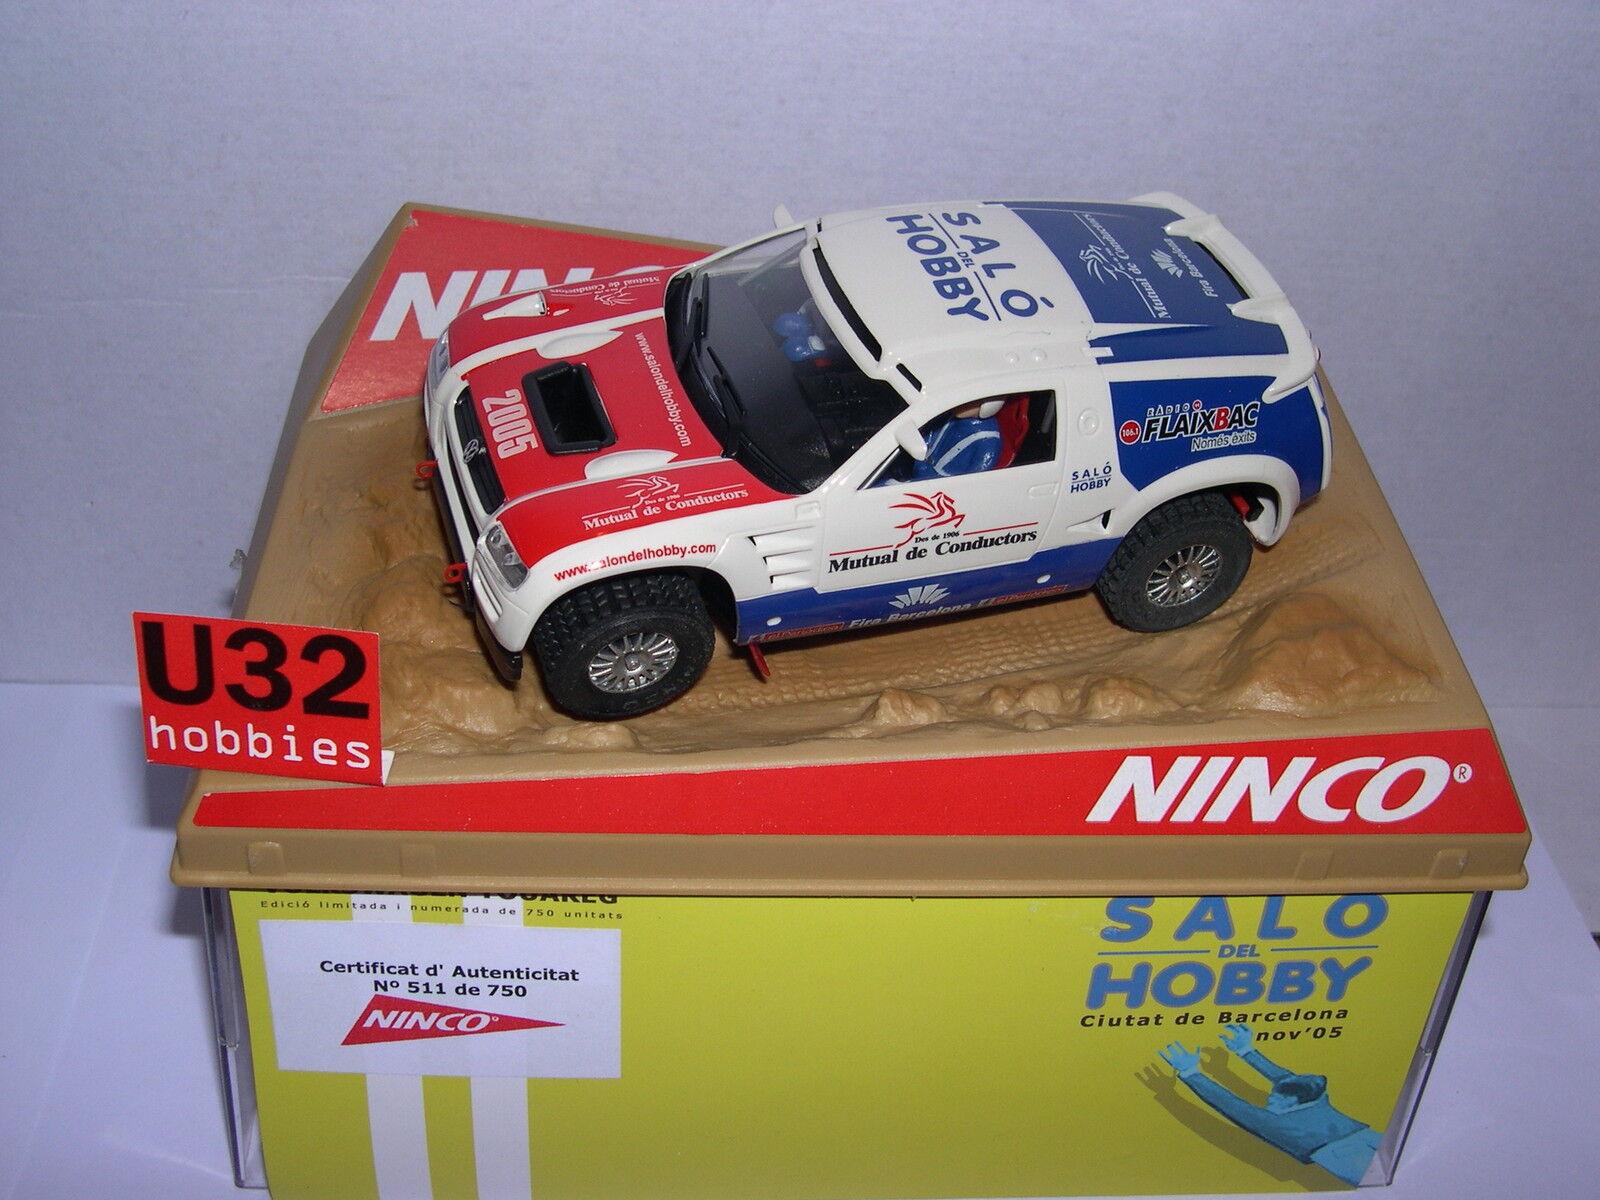 NINCO 50403 SLOT CAR VOLKSWAGEN VW TOUAREG LOUNGE HOBBY 2005 LTED.ED MB